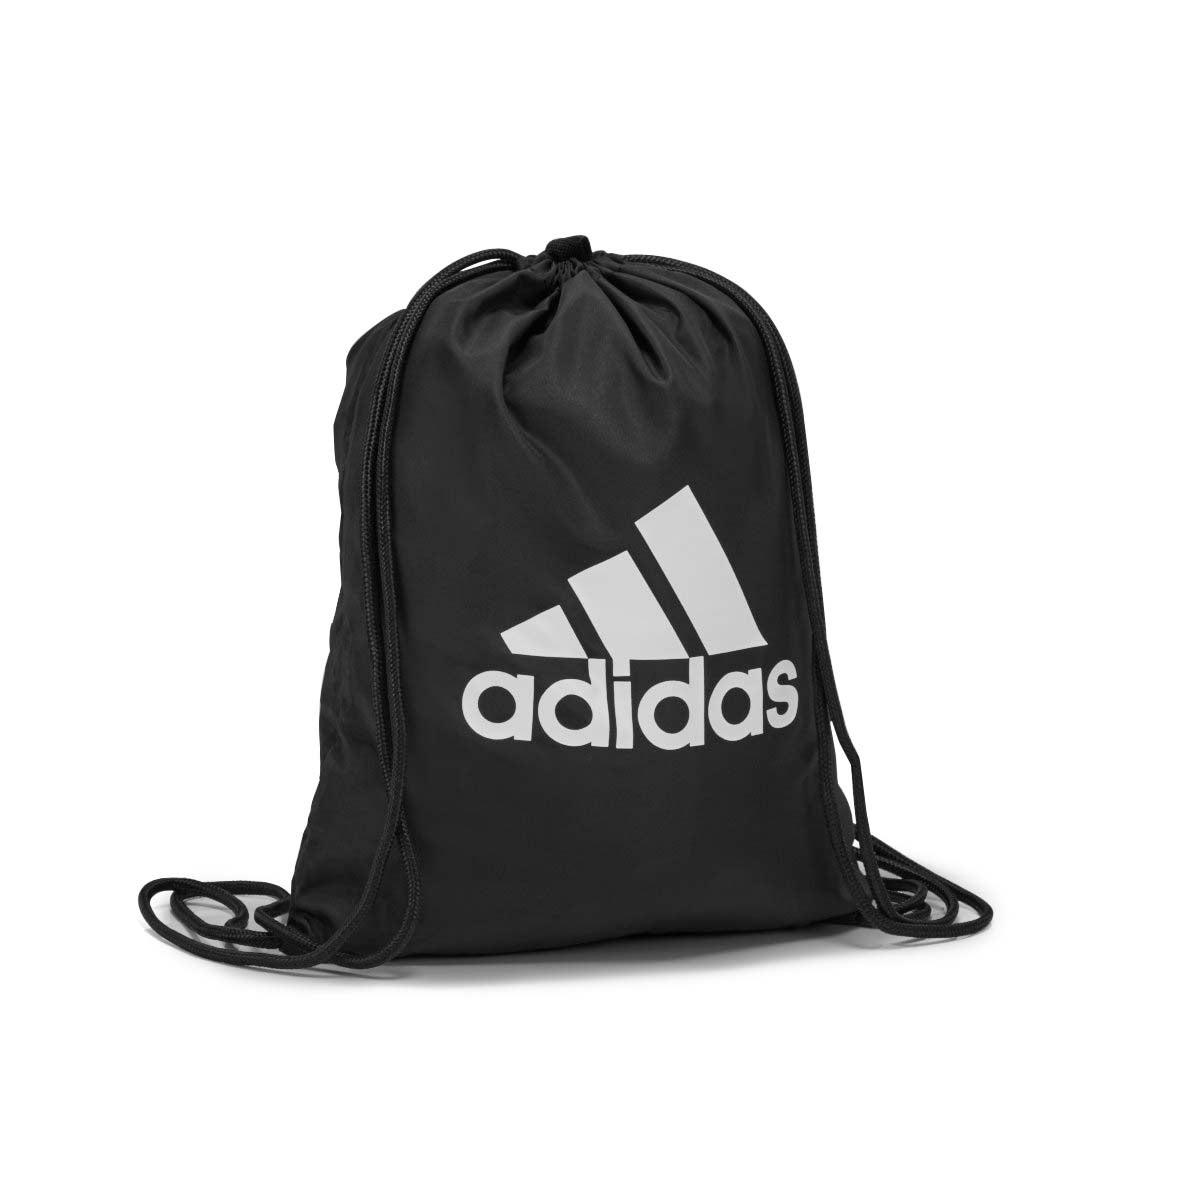 Adidas Per Logo GB bk/bk/wt sackpac